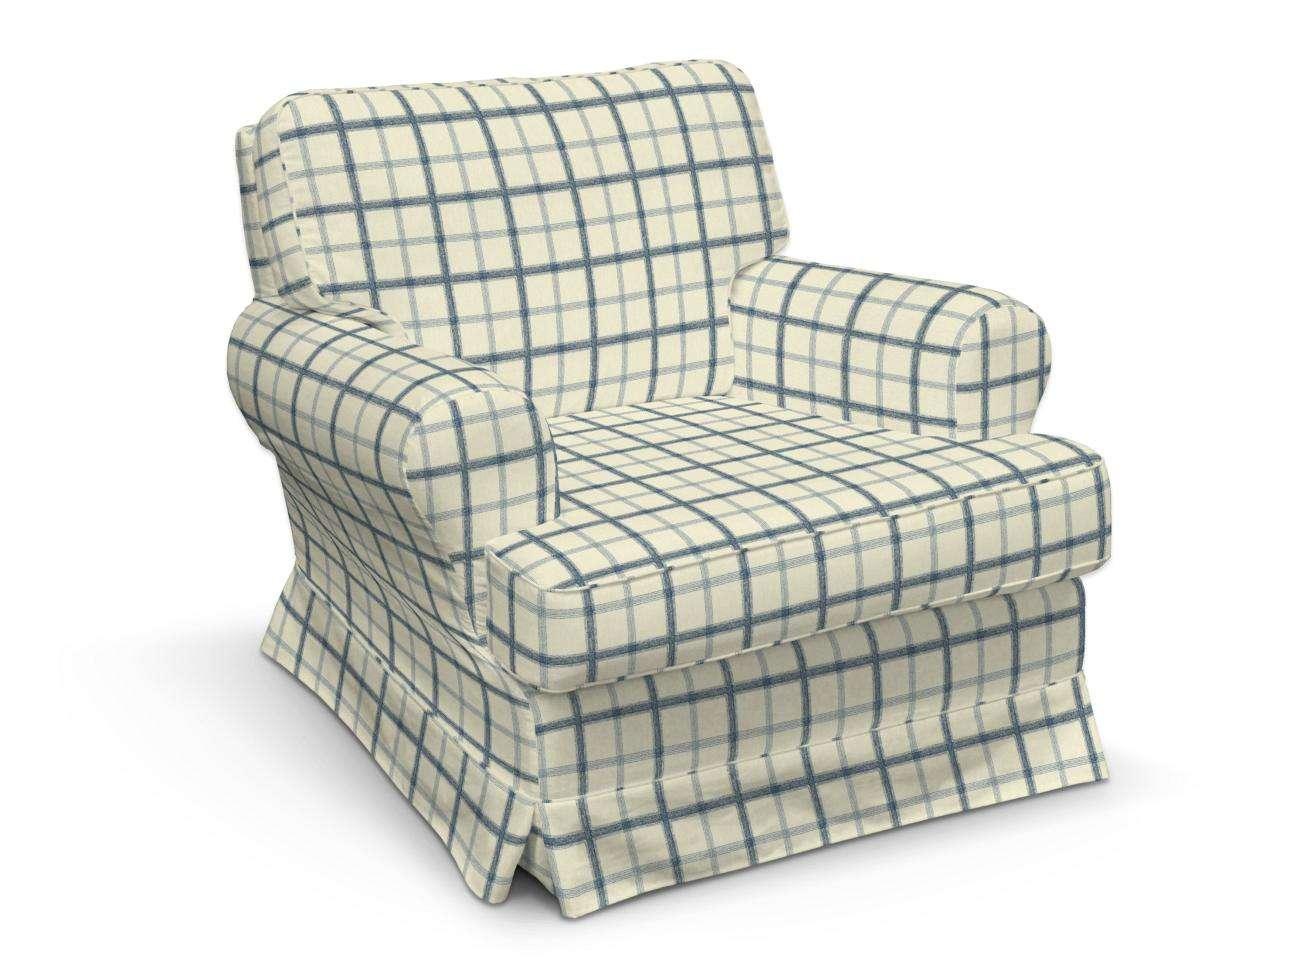 Barkaby Sesselbezug von der Kollektion Avinon, Stoff: 131-66